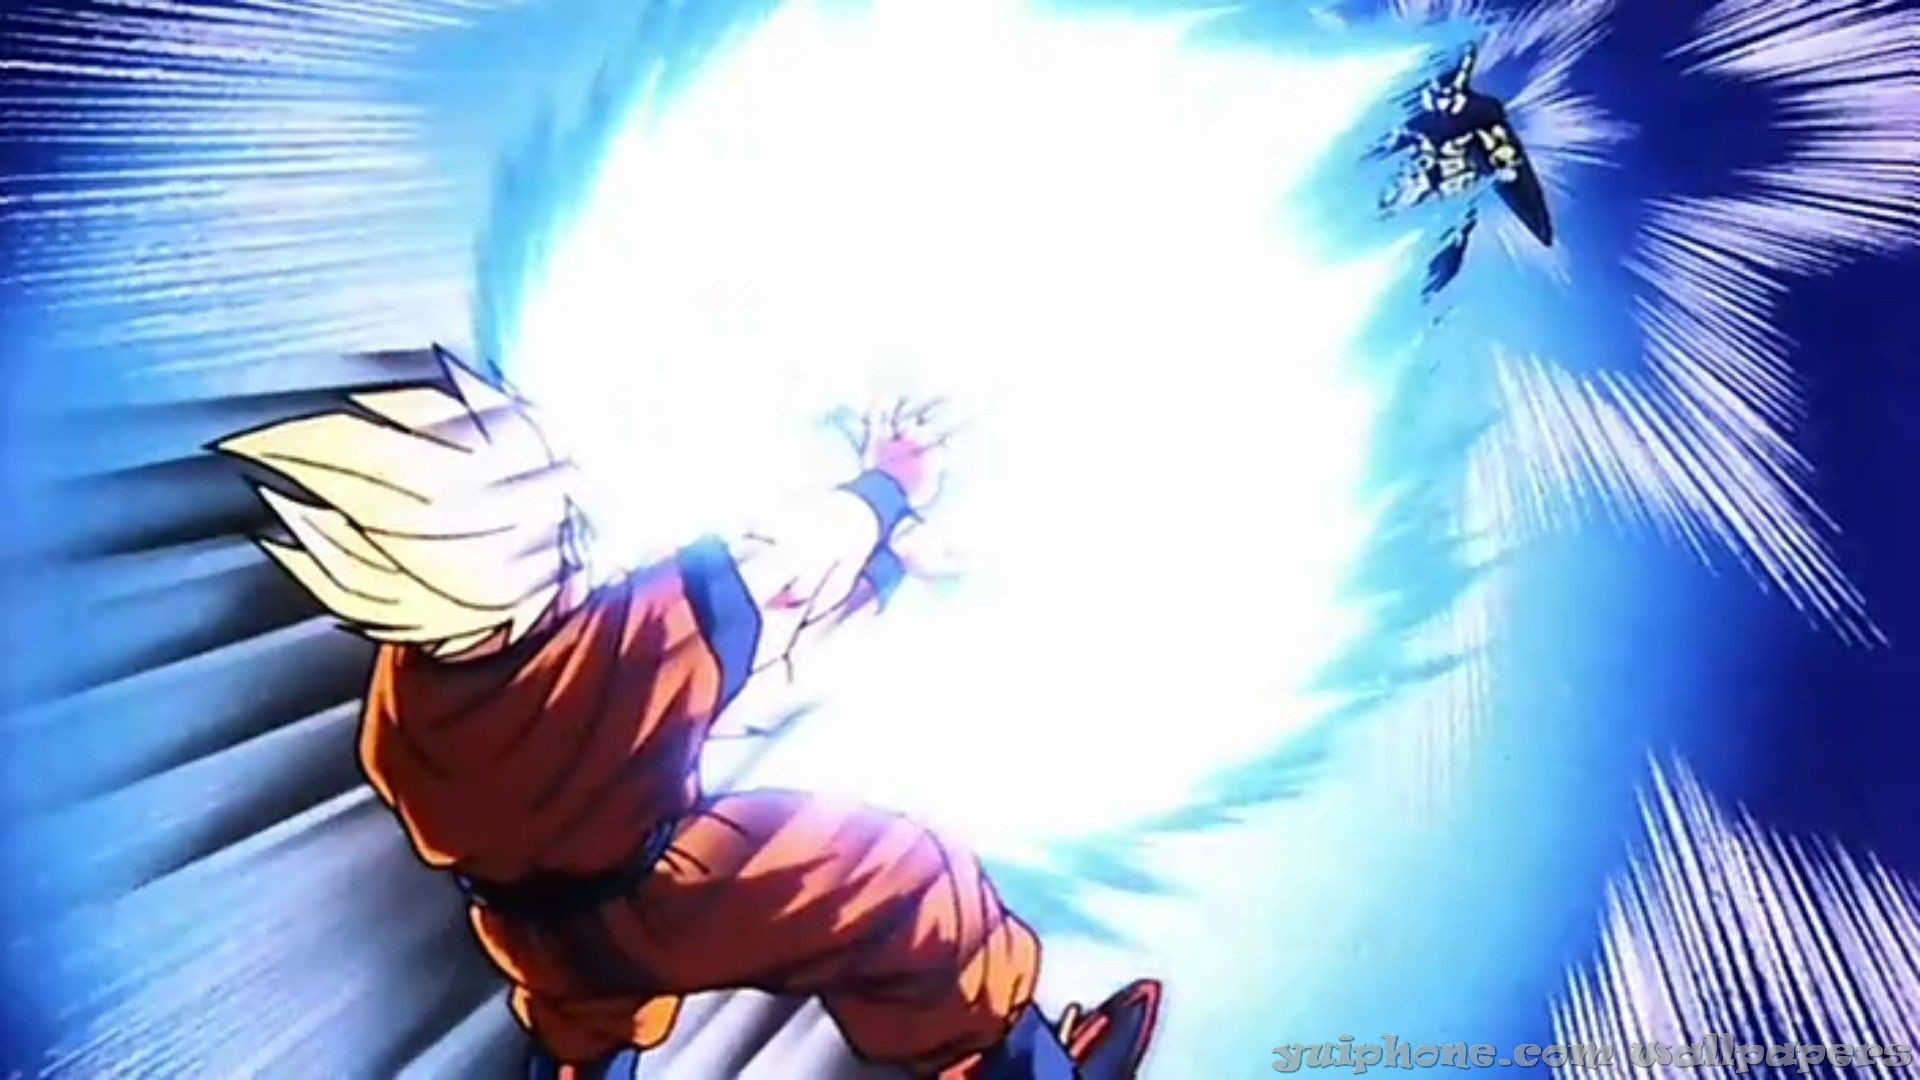 Dragon ball goku wallpaper 70 images - Goku kamehameha live wallpaper ...